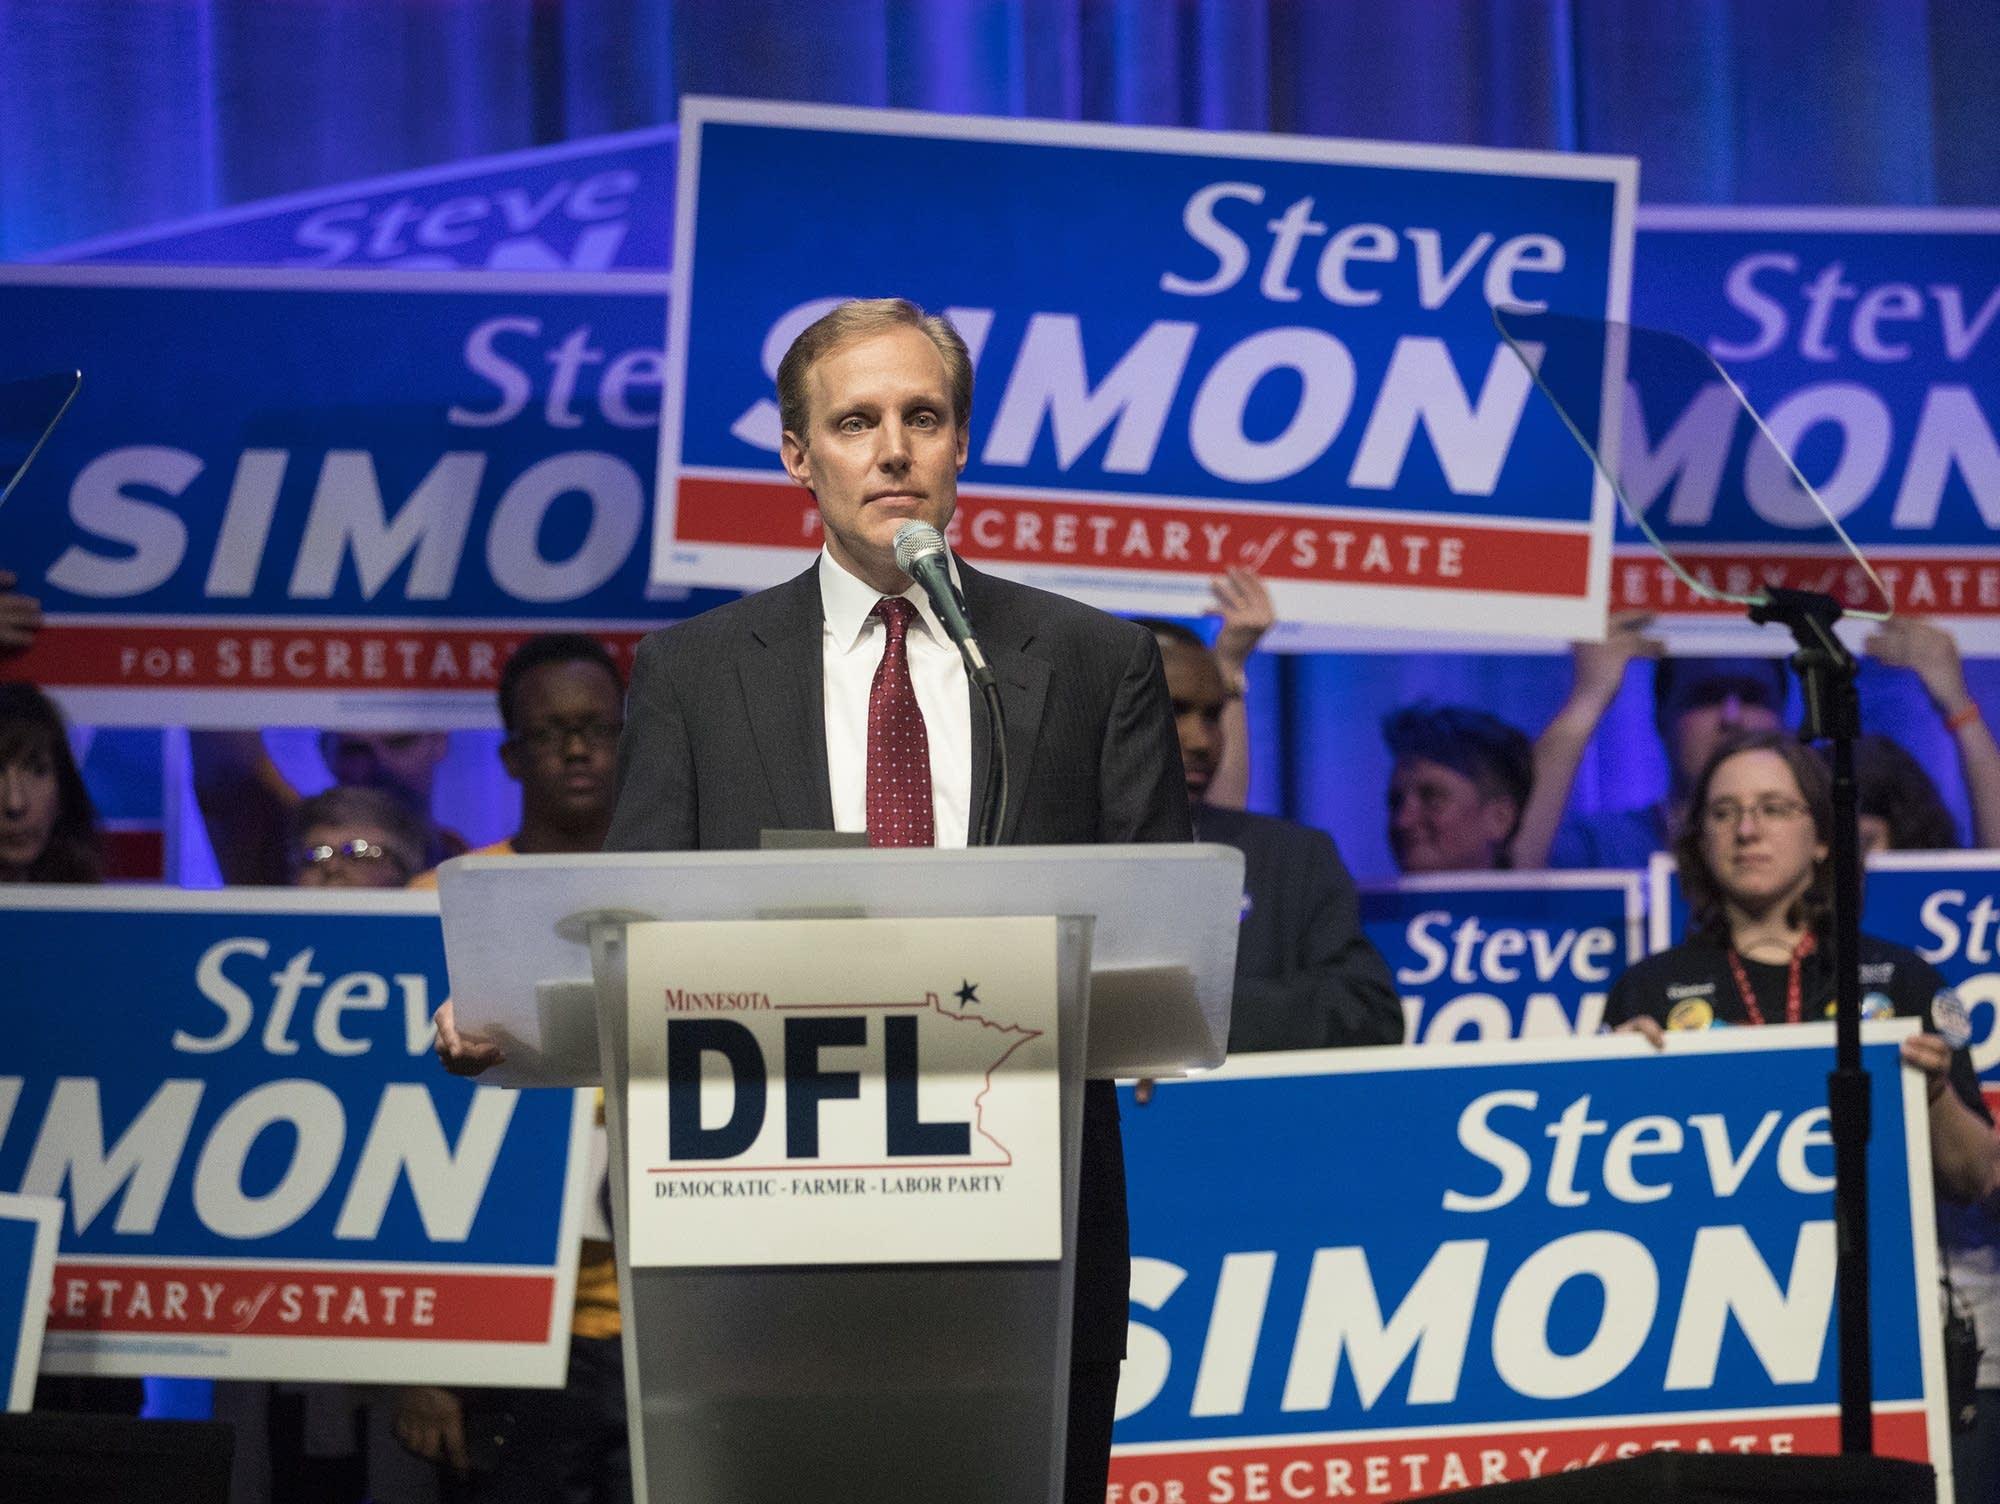 Steve Simon at Minnesota DFL convention.